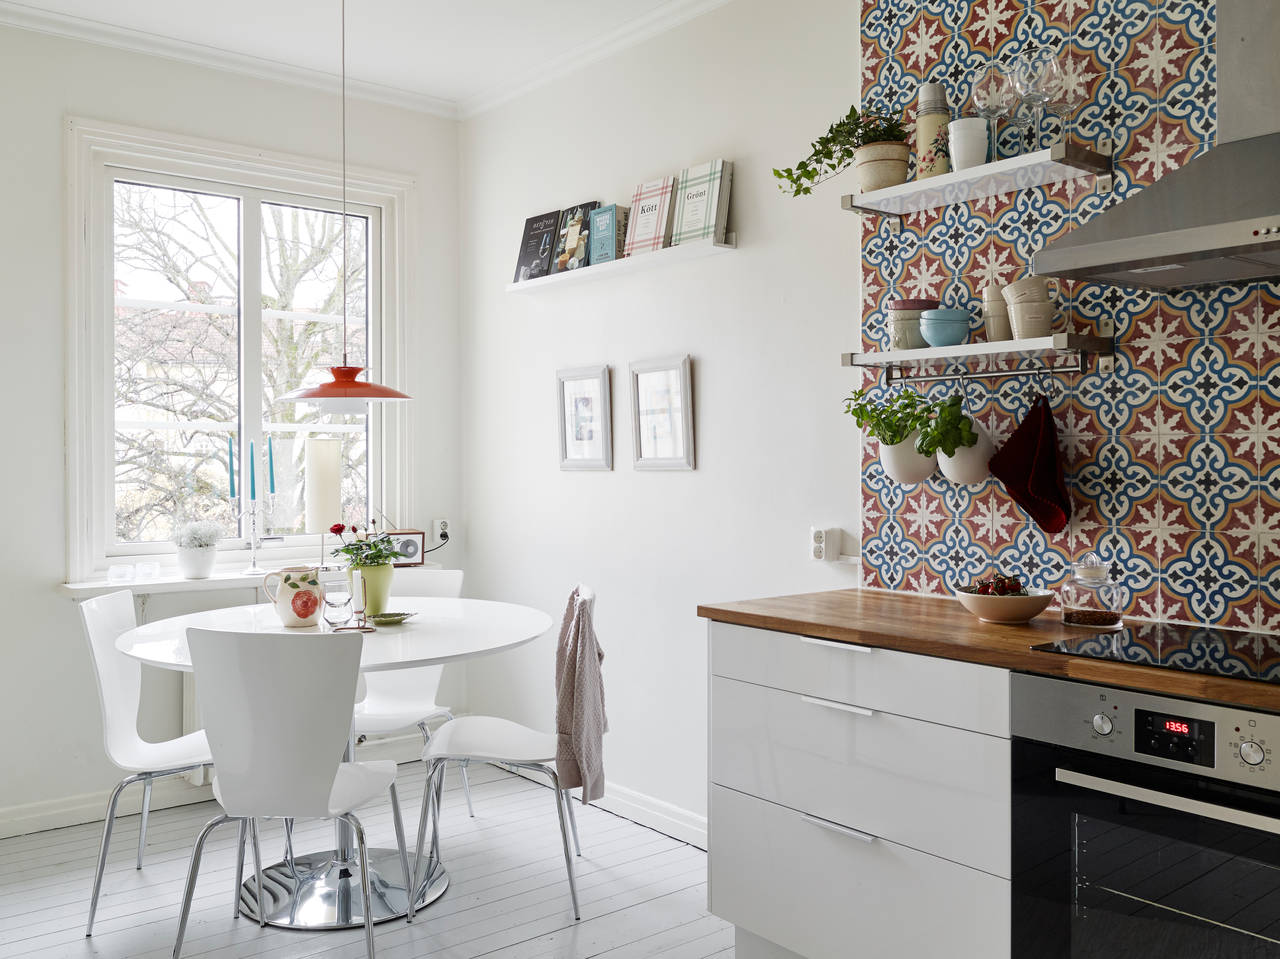 keuken tegels vervangen : Portugese Tegels In Keuken Thomas Gaspersz